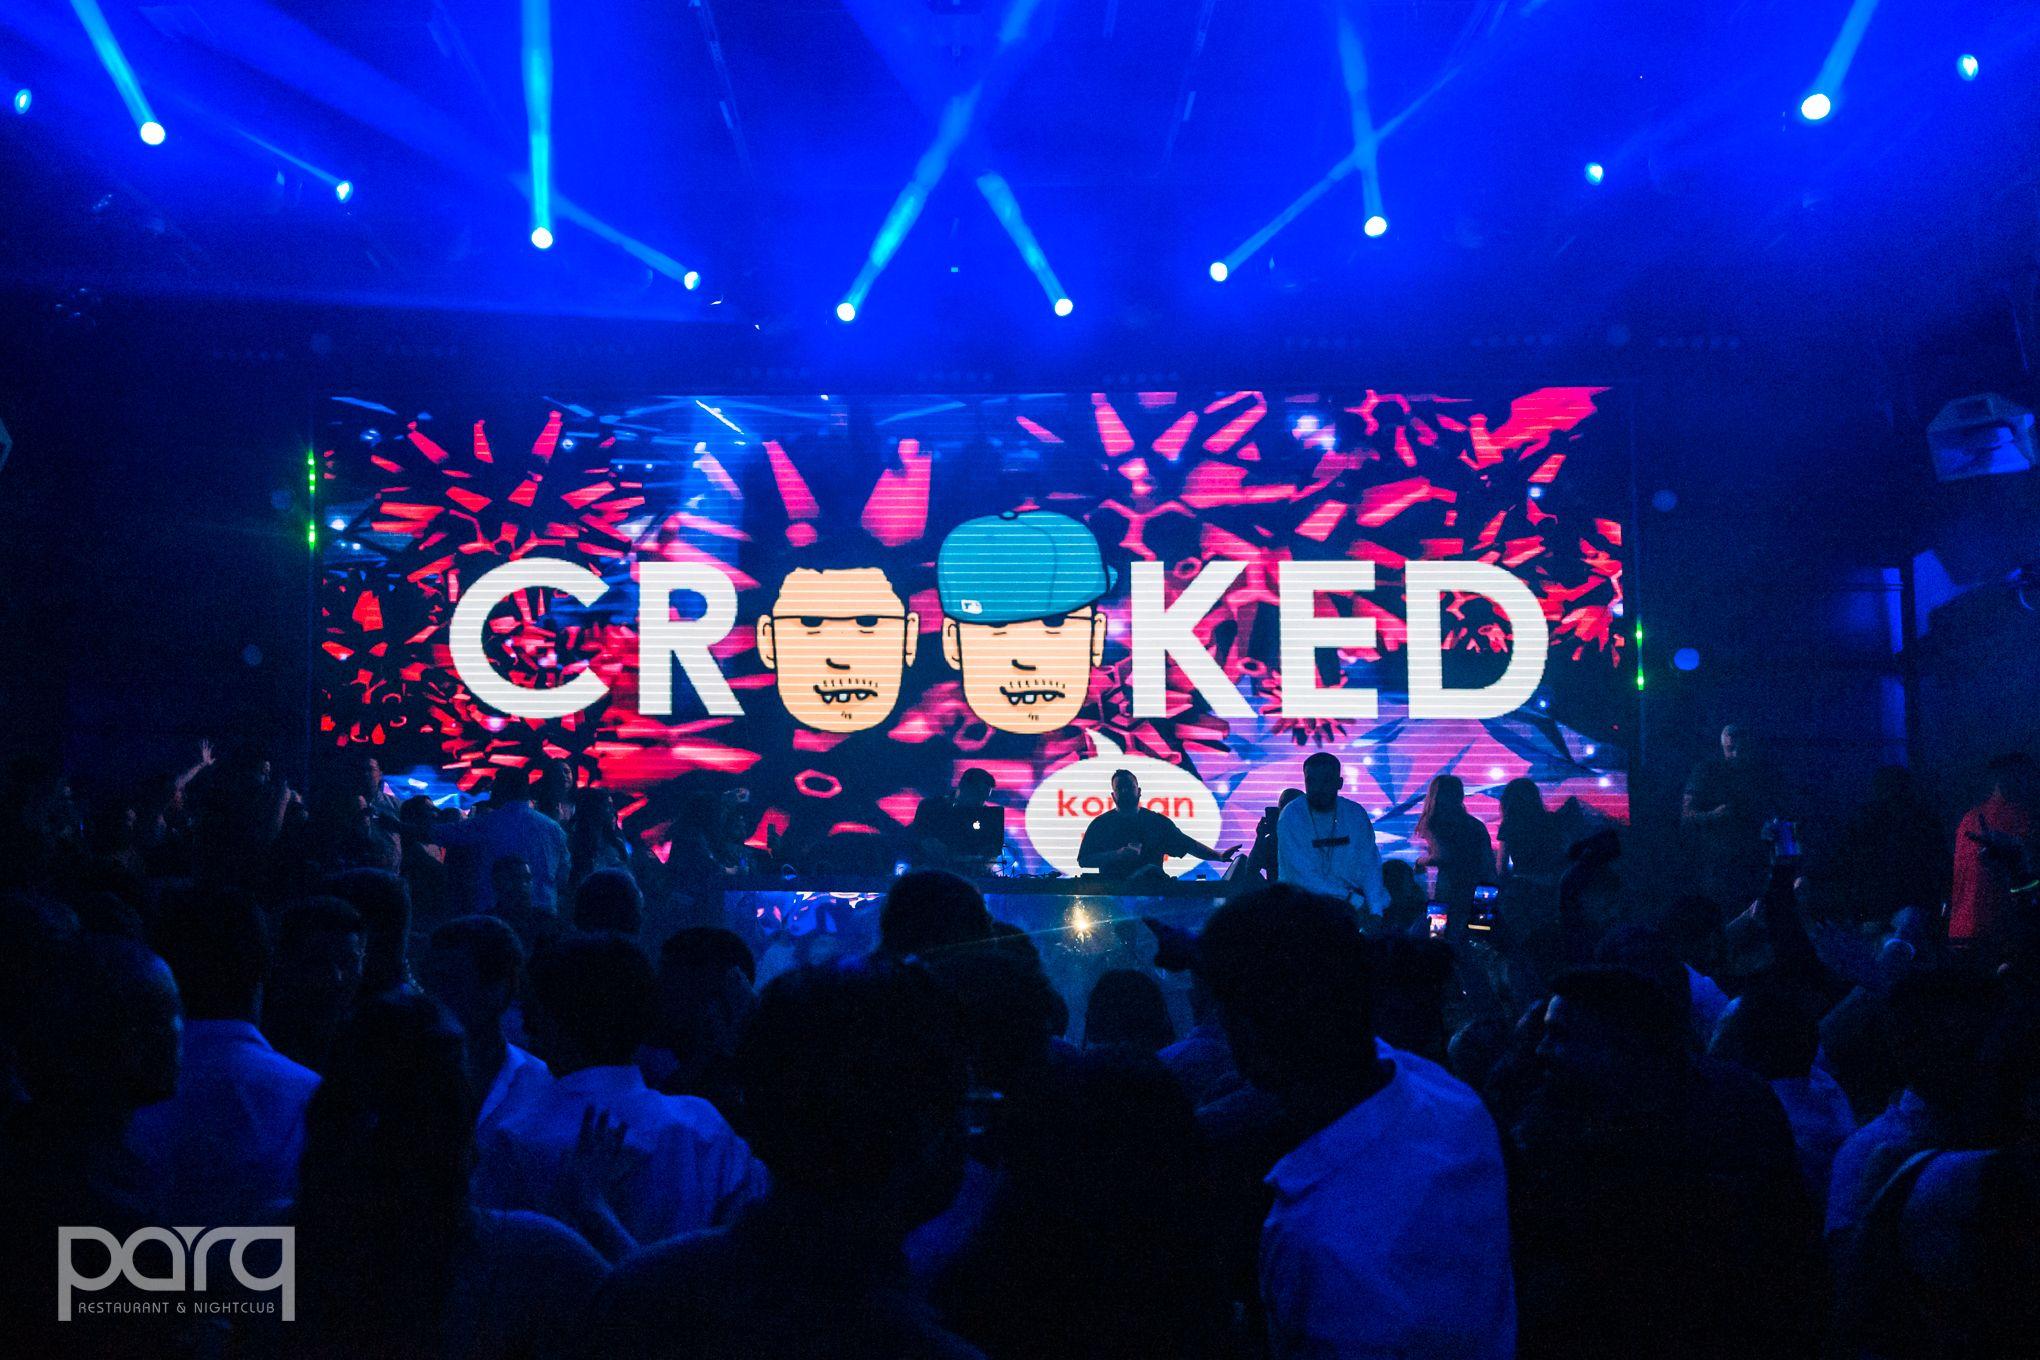 04.13.19 Parq - Crooked-18.jpg